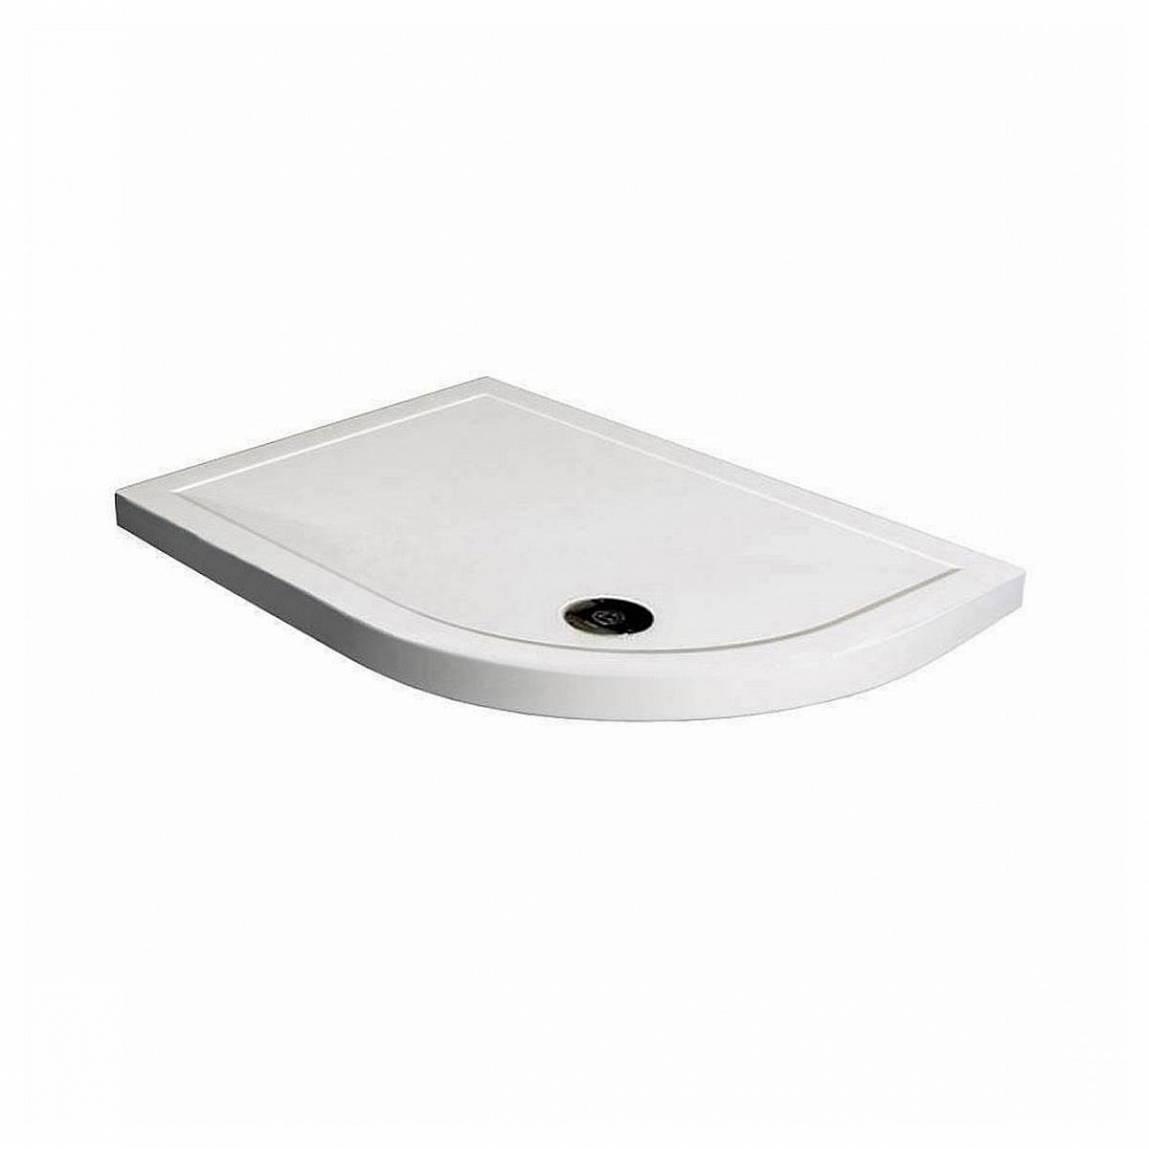 Image of Offset Quadrant Stone Shower Tray 1000 x 800 RH